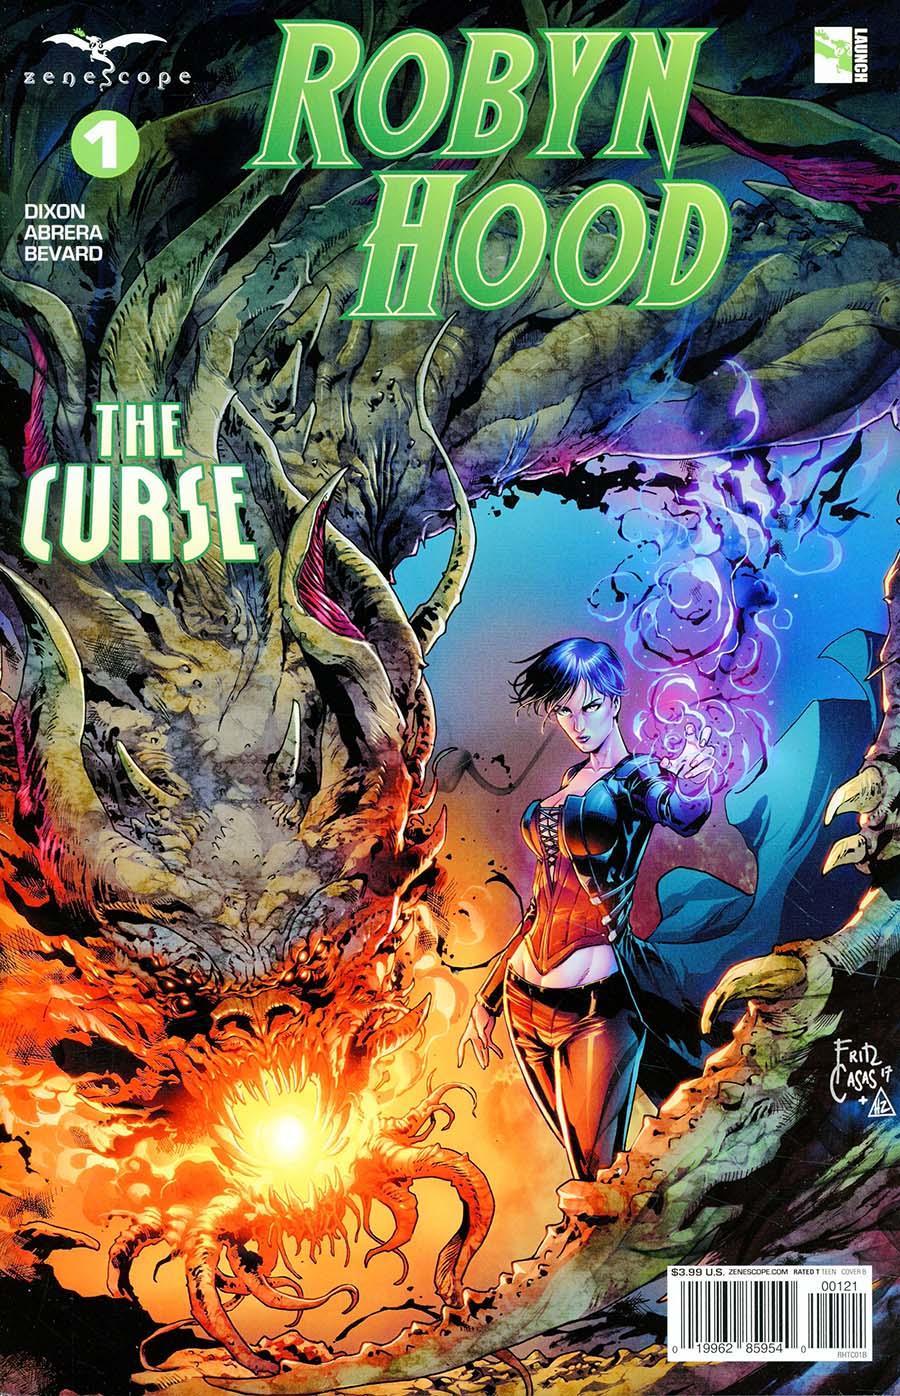 Grimm Fairy Tales Presents Robyn Hood The Curse #1 Cover B Fritz Casas